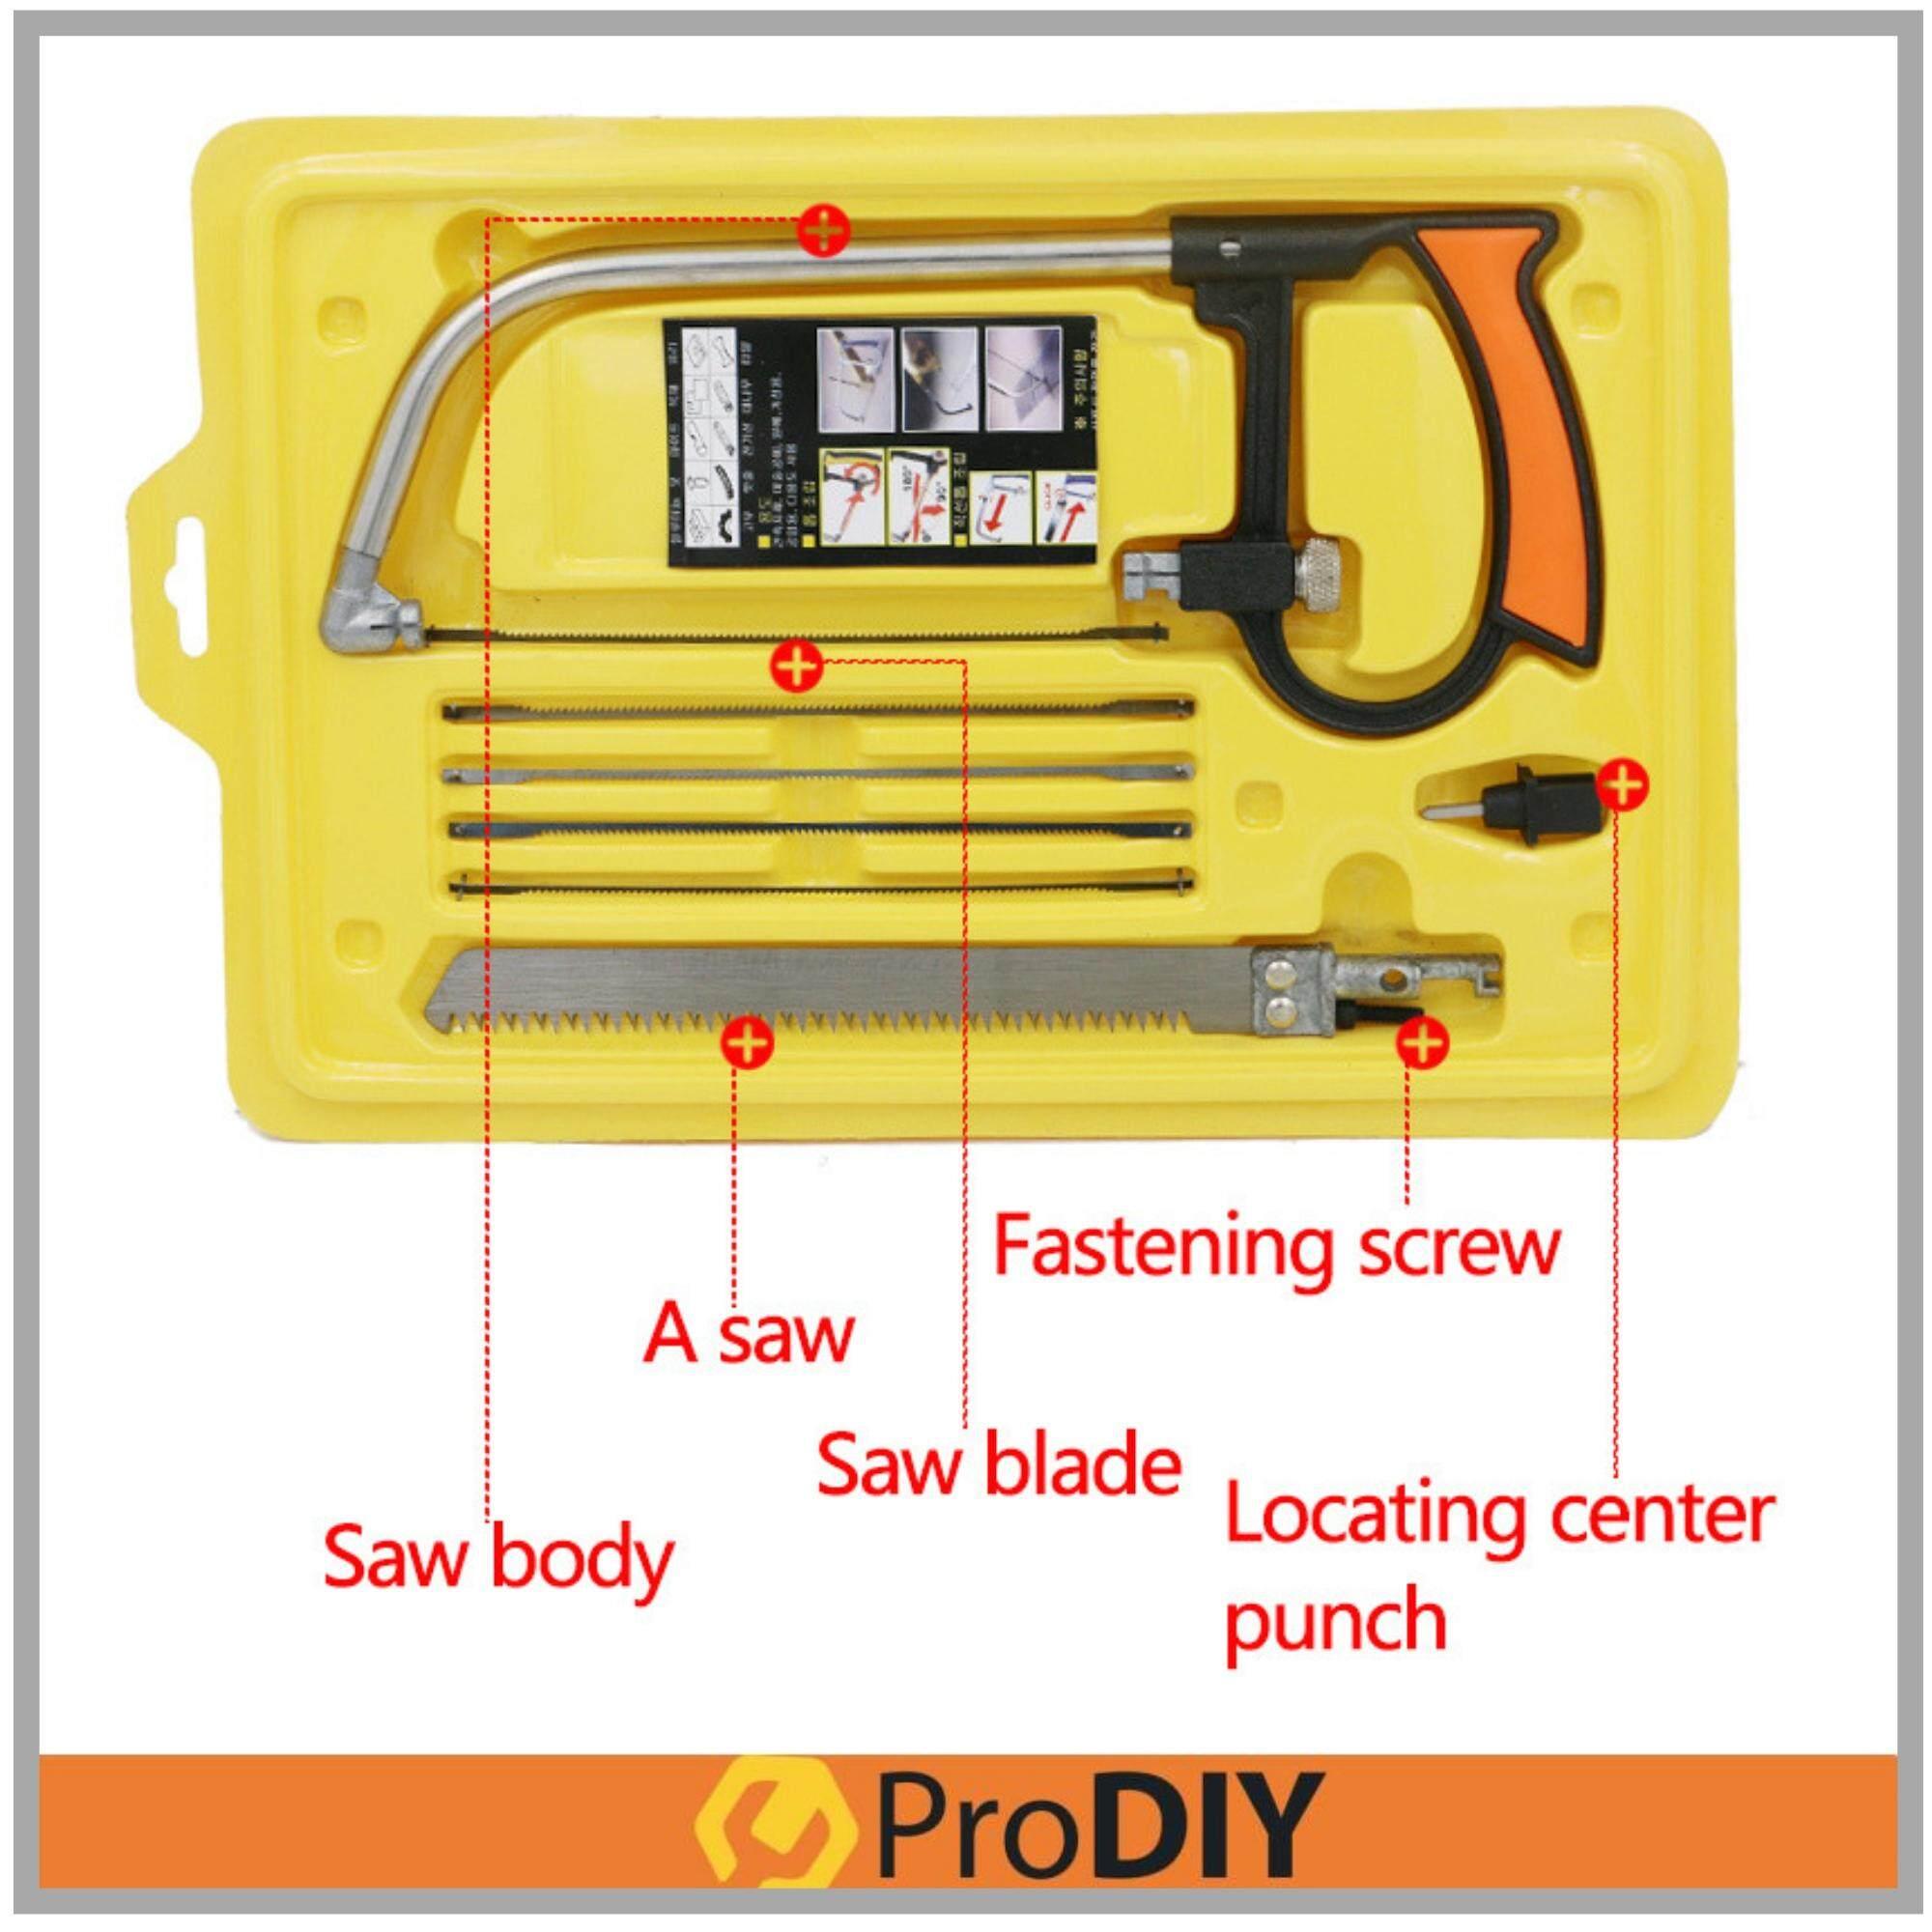 8 in 1 Multifunction Mini Saw Hacksaw Hand Saw Magic Saw Wonder Saw Hand Diy Home Tools Kit